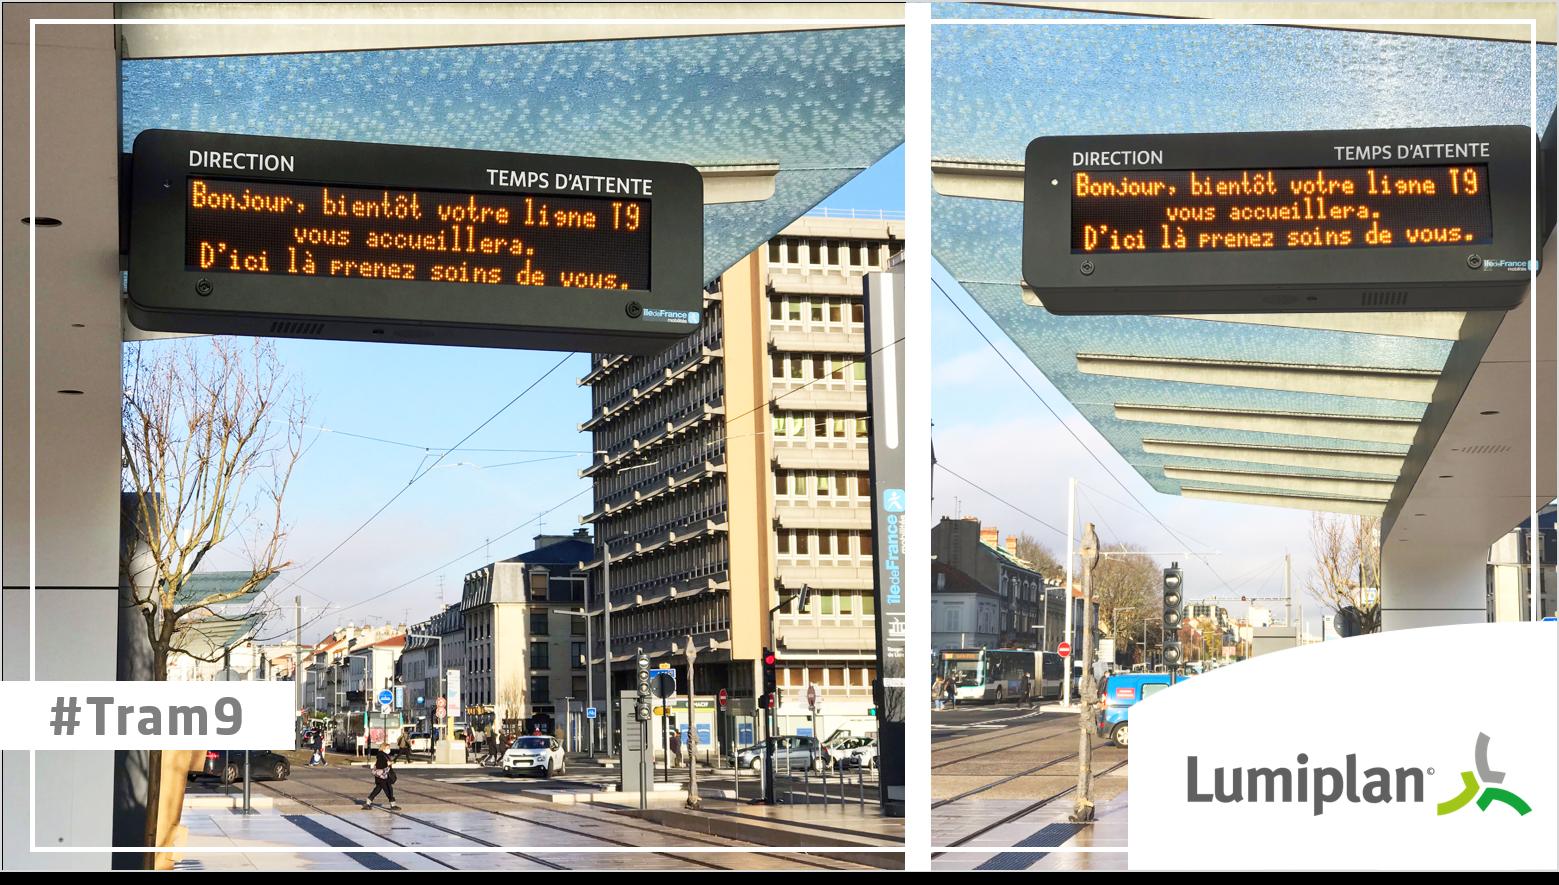 Lumiplan_SmartMobility_Tram9_Choisy_2021.01